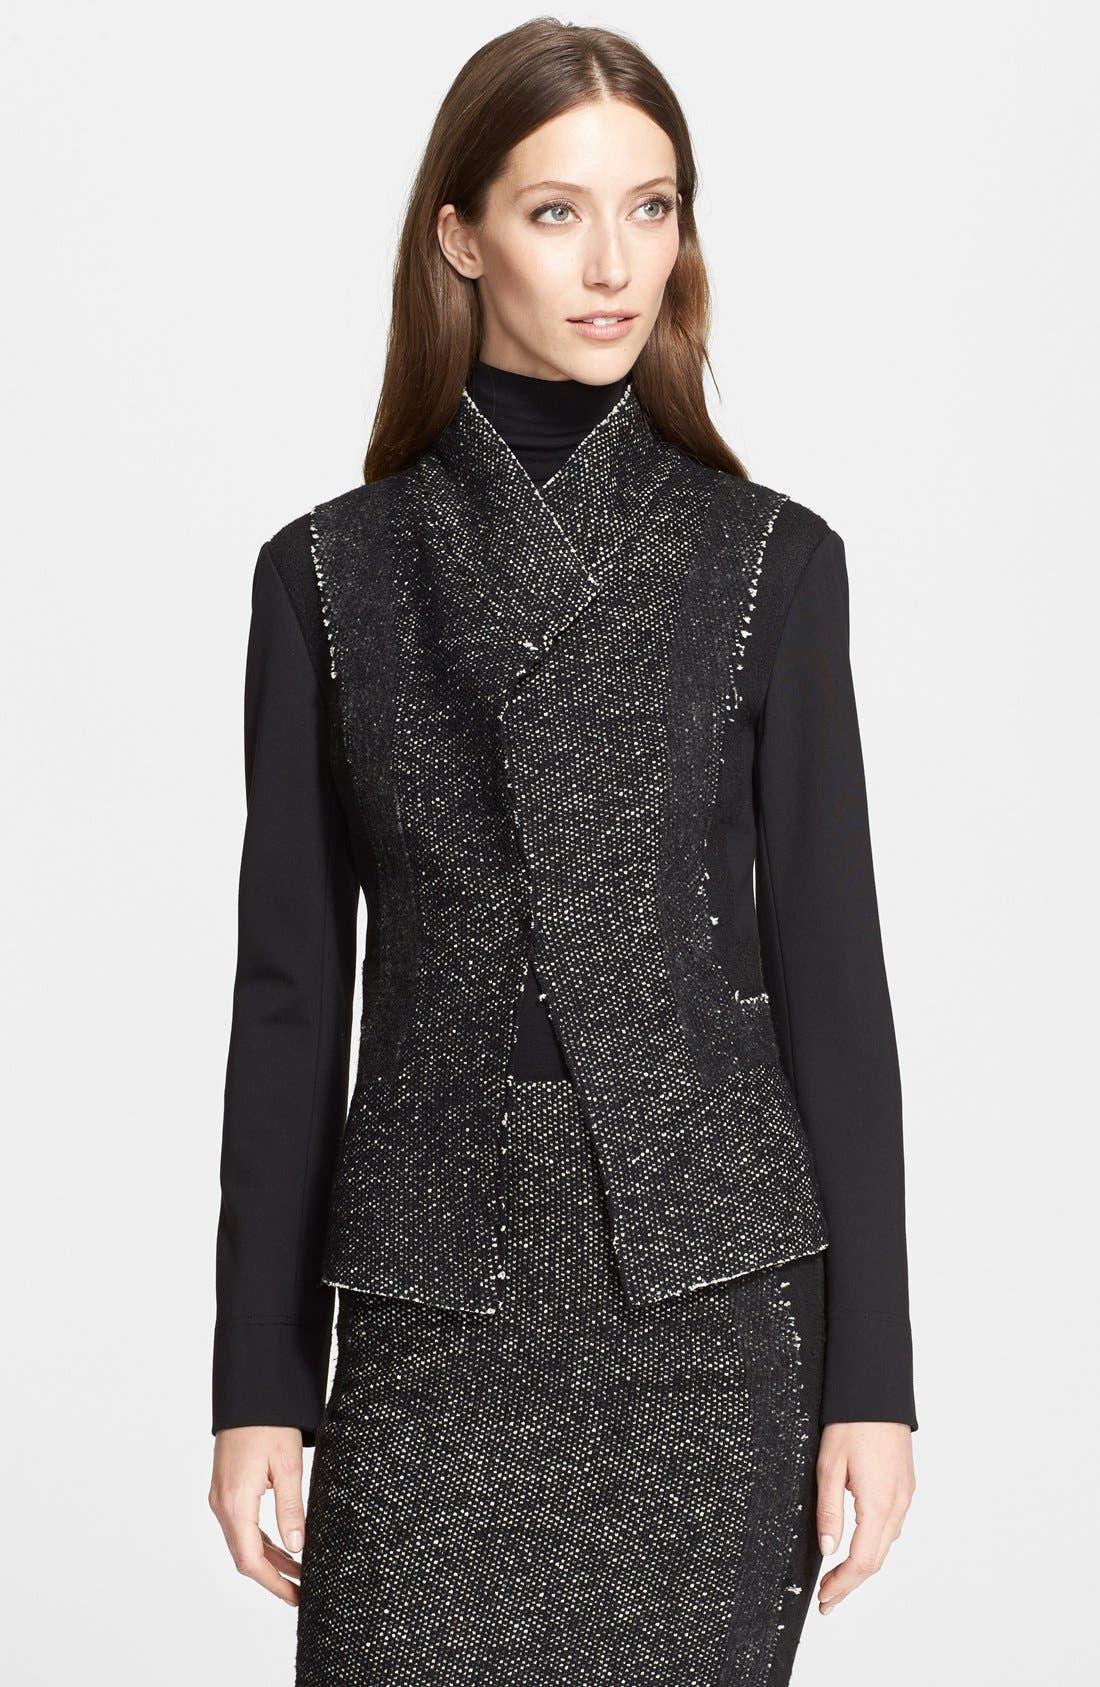 Alternate Image 1 Selected - Donna Karan New York Tweed & Jersey Jacket